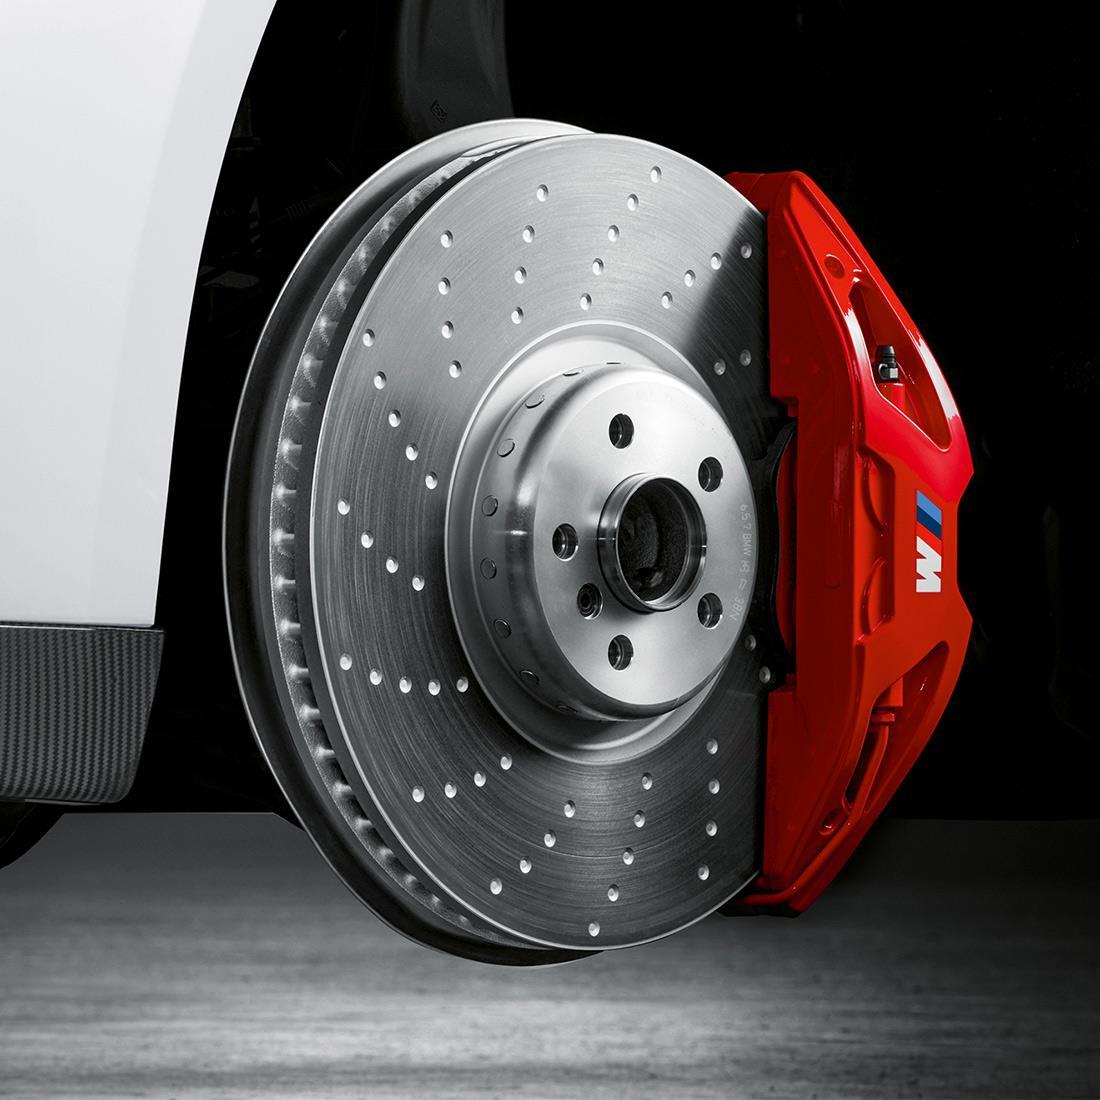 M Performance 19-inch brake system